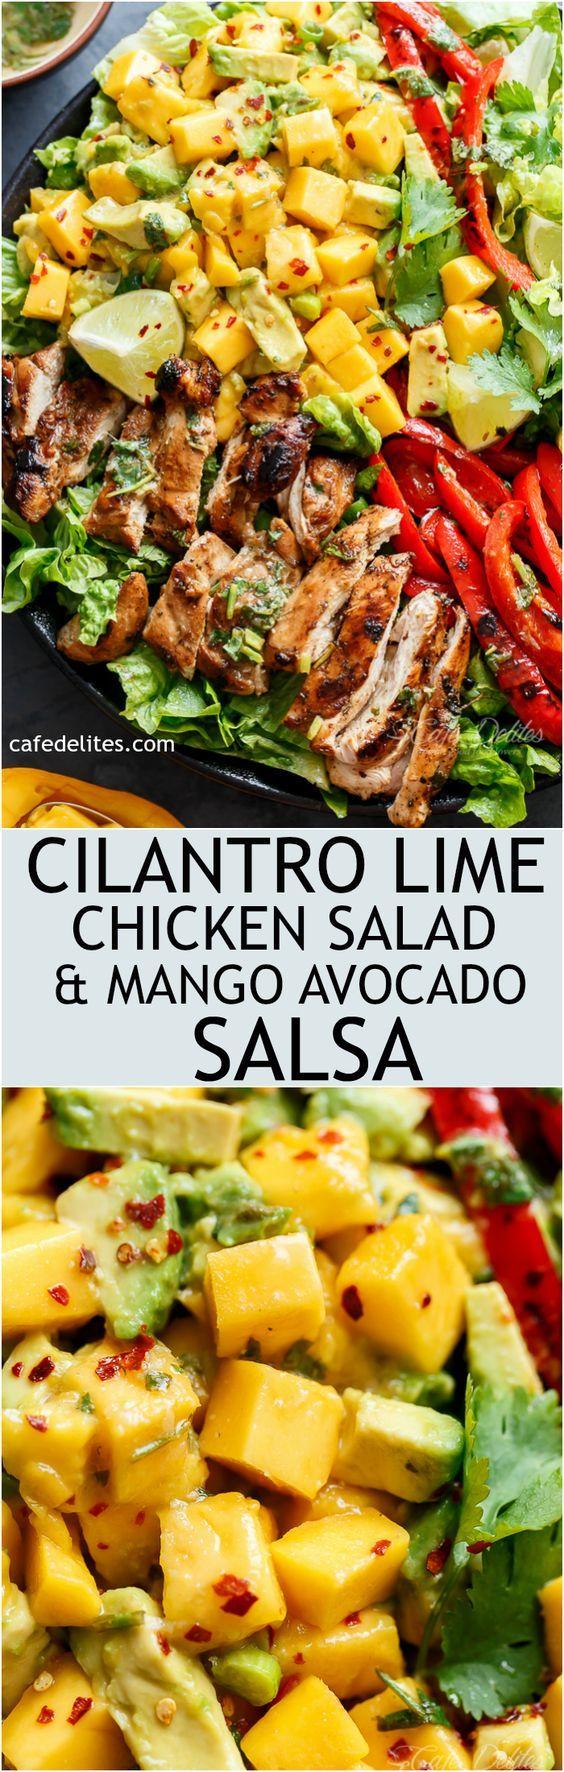 Cilantro Lime Chicken Salad Mango Avocado Salsa